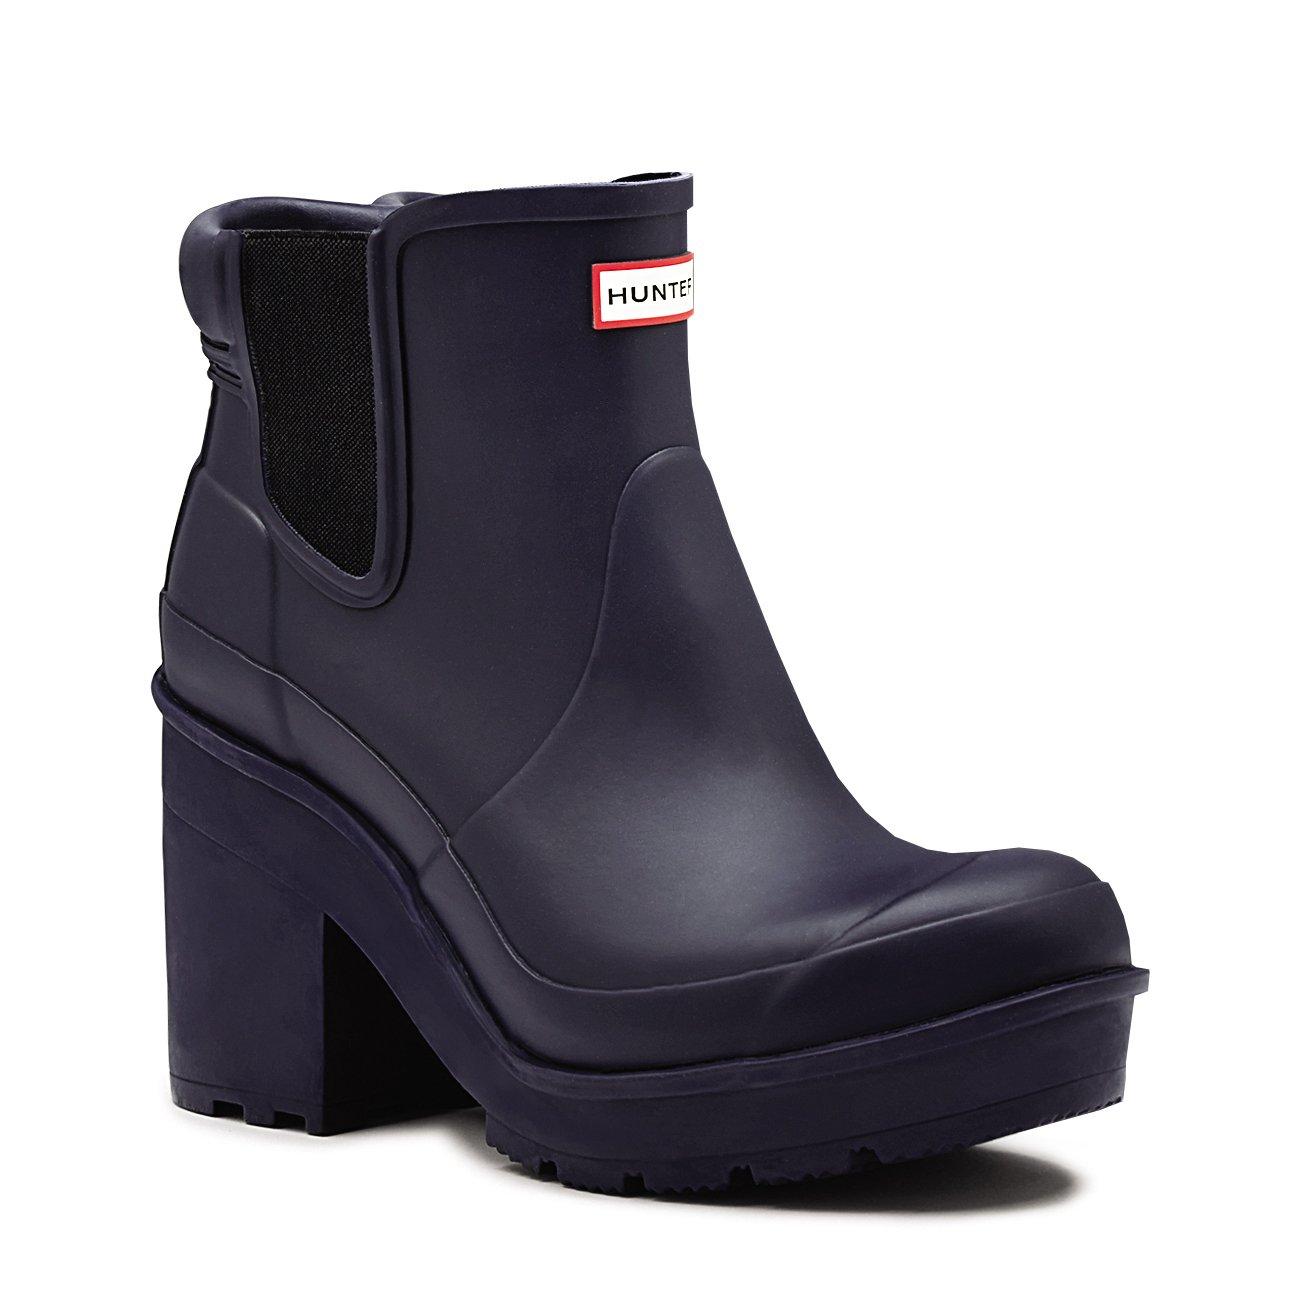 Hunter Womens Original Block Heel Chelsea Yard Snow Wellingtons Boots - Midnight - 9